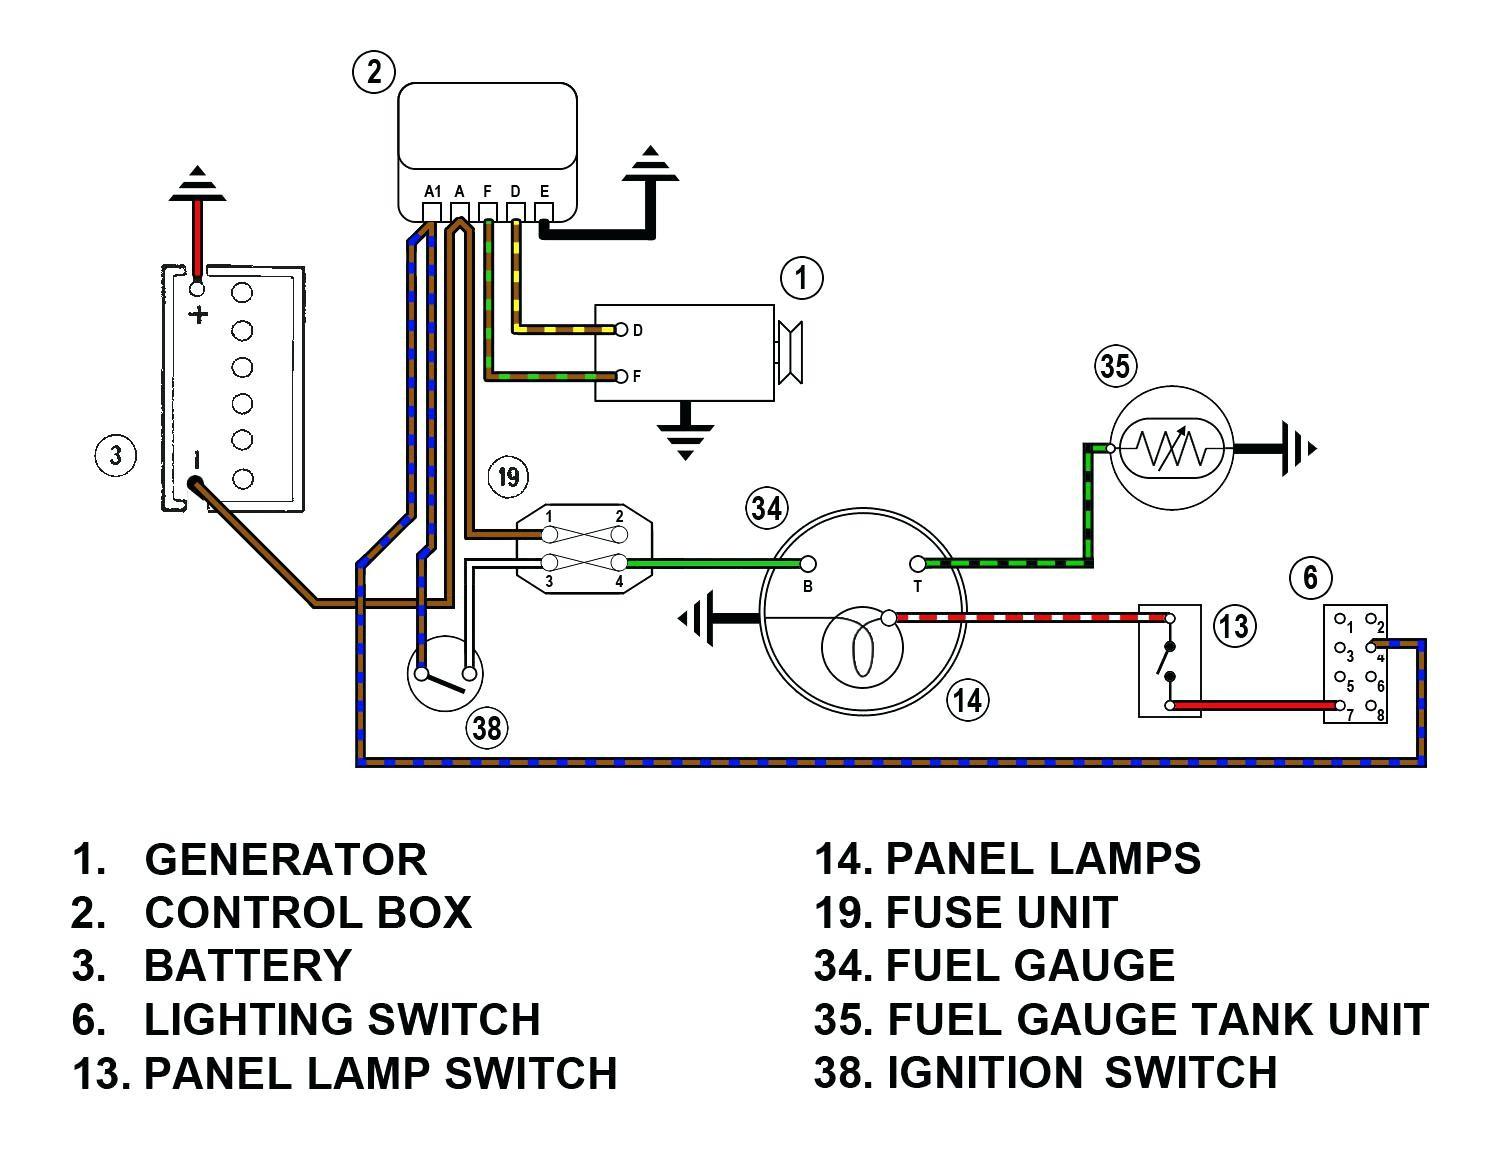 hight resolution of trailer junction box wiring diagram new wiring diagram image bobcat wiring diagram full